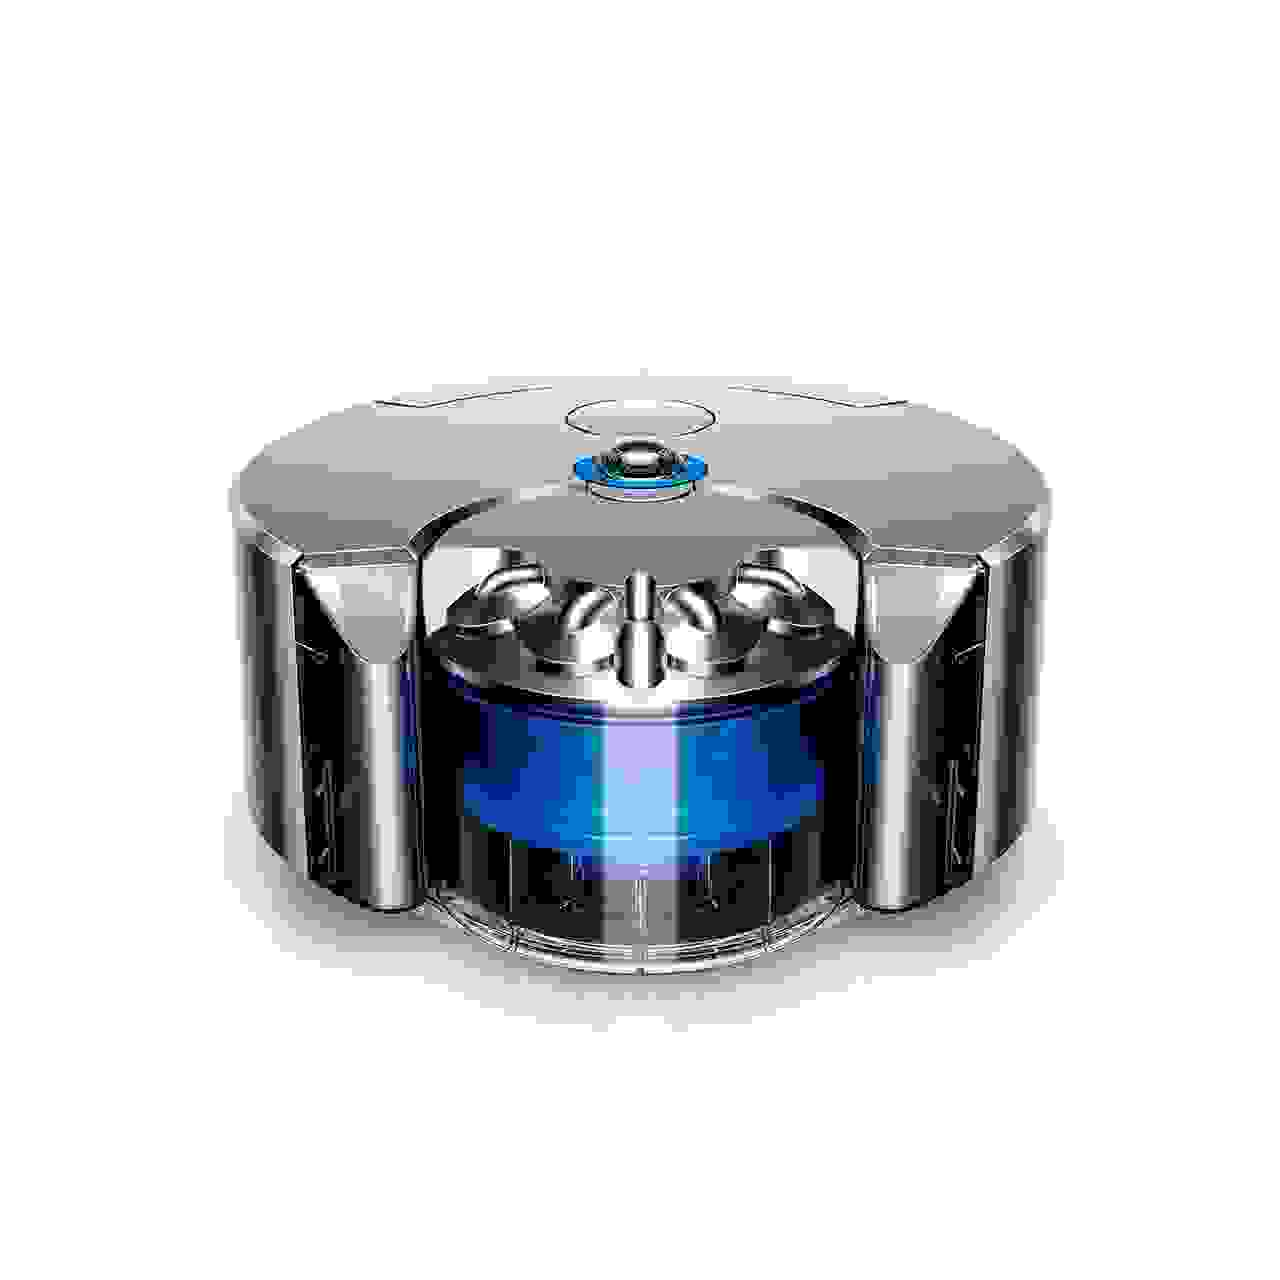 Dyson's robot vacuum fits the company's design language.